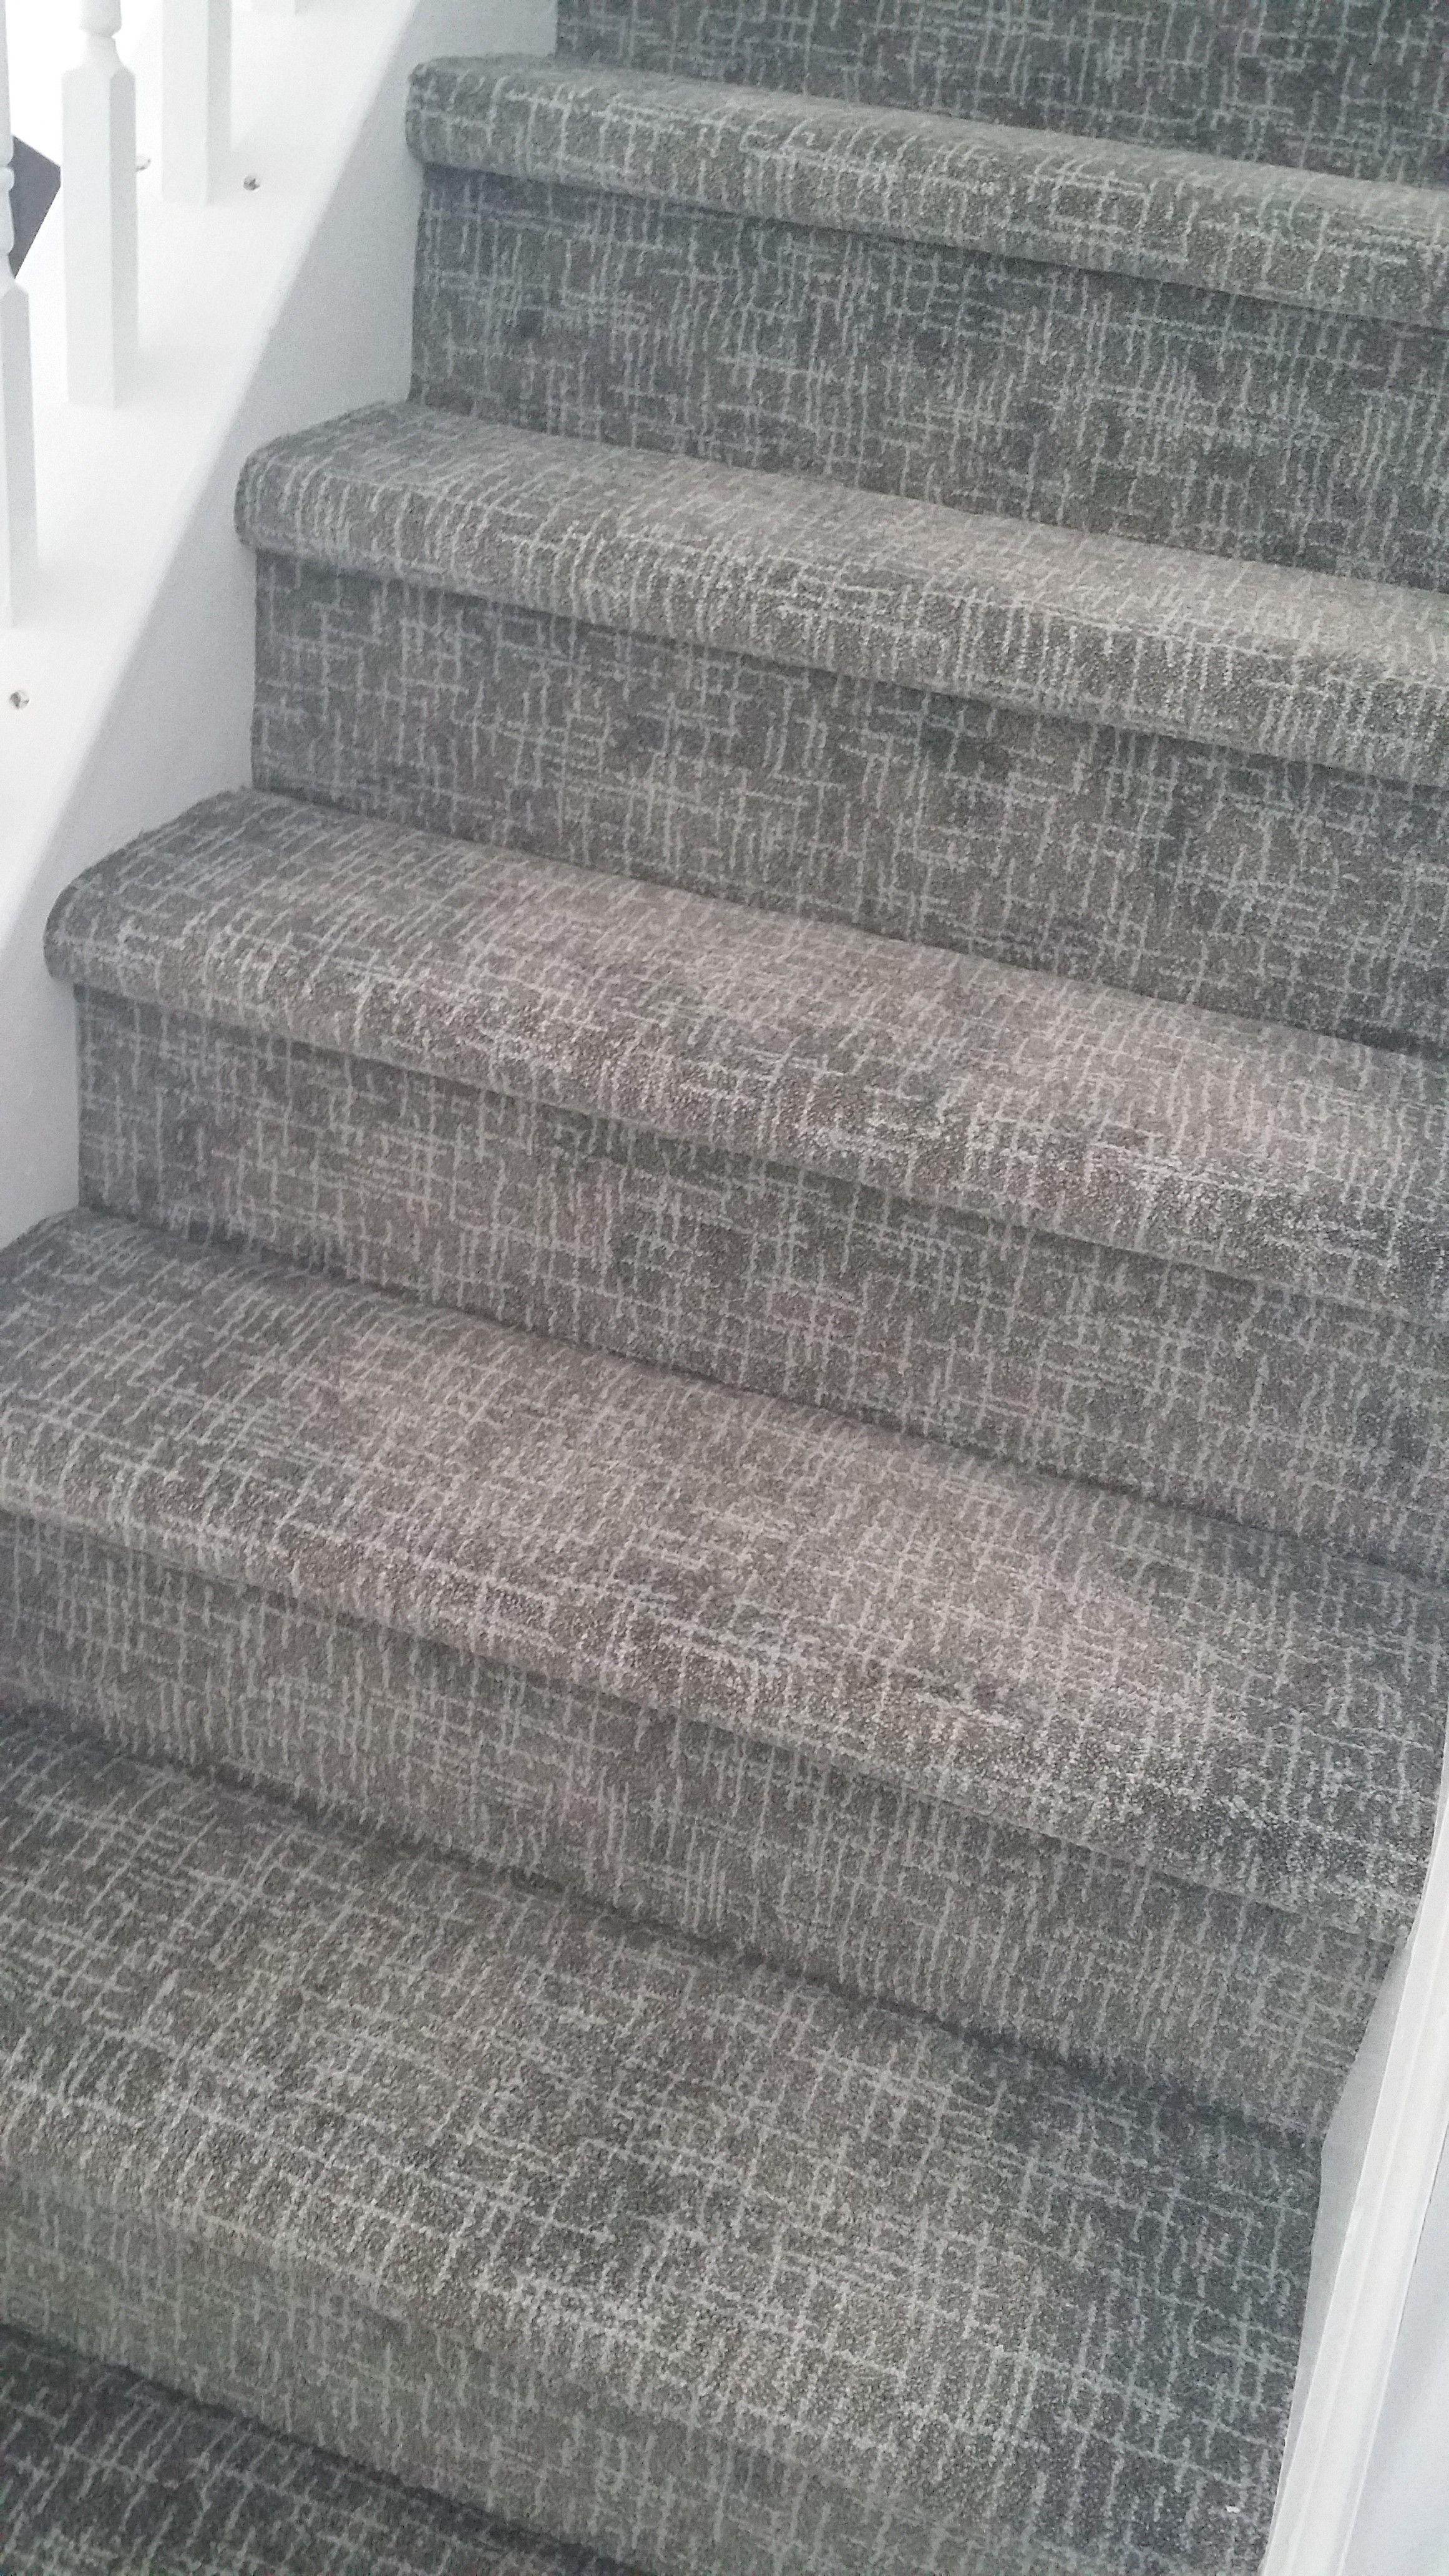 Stairway Leading Upstairs In 2020 Stair Runner Carpet Home Depot Carpet Patterned Stair Carpet